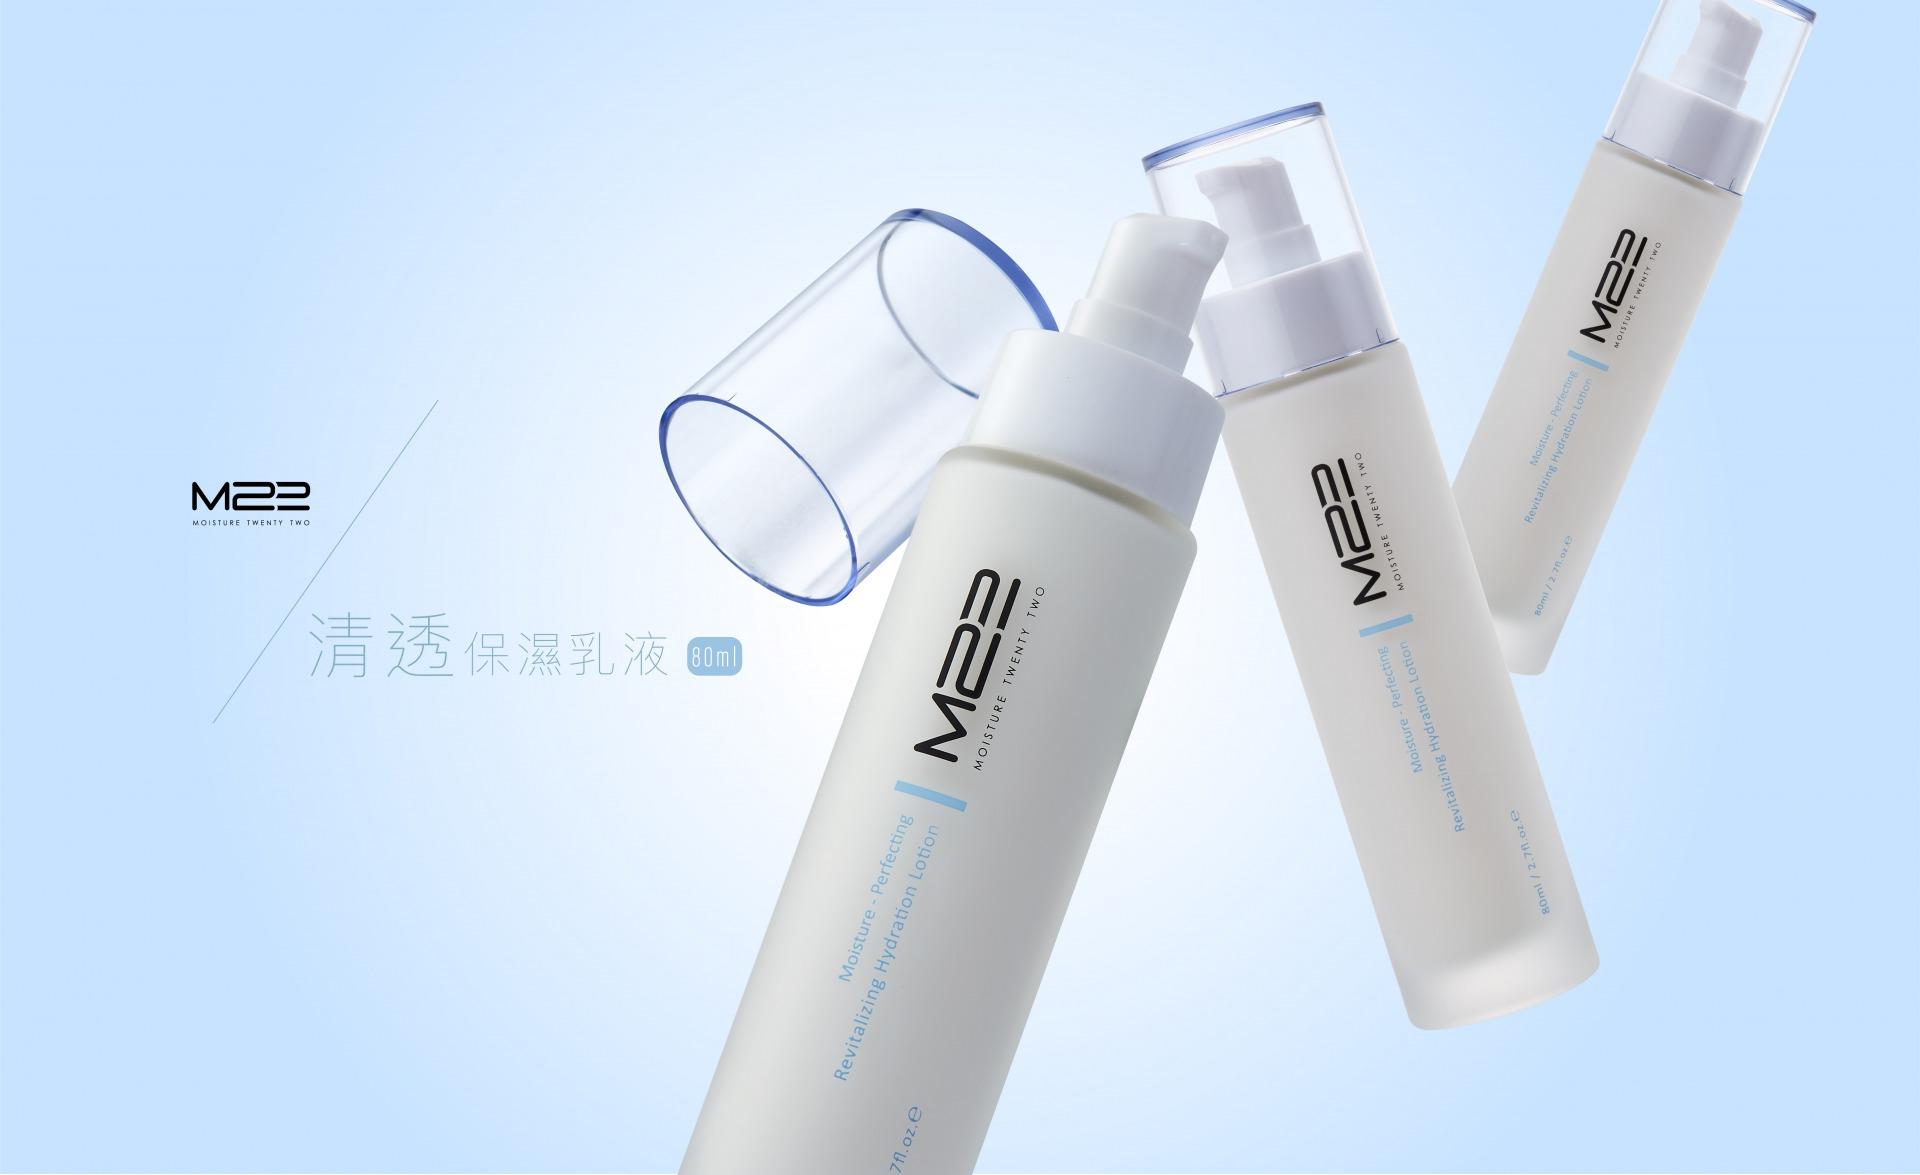 M22_v2_Products清透保濕_清透保濕乳液V2_index